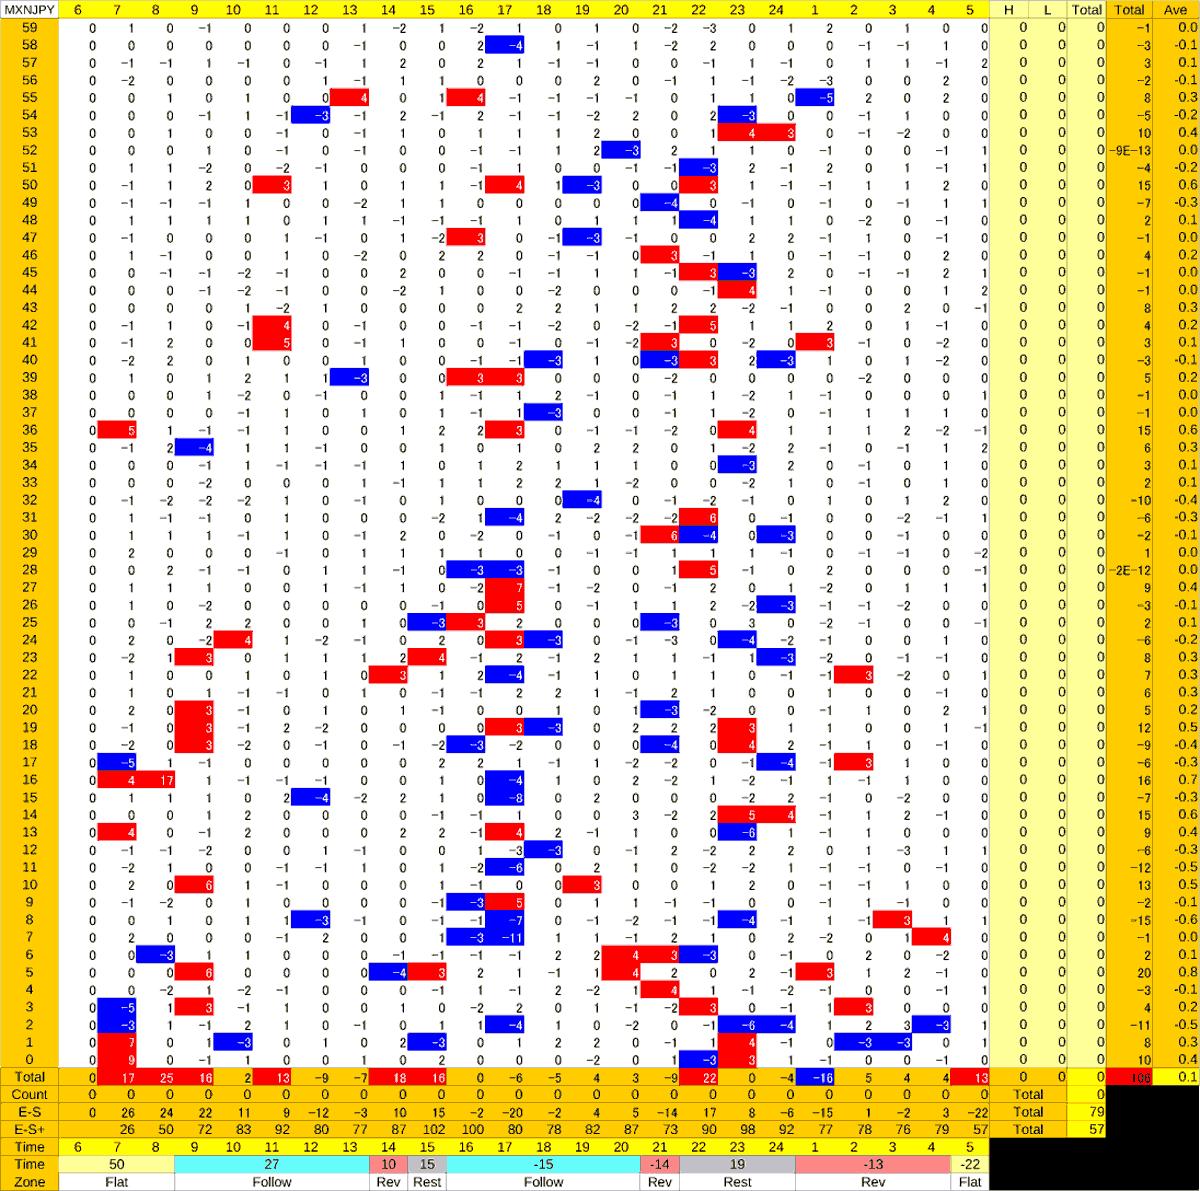 20200601_HS(3)MXNJPY